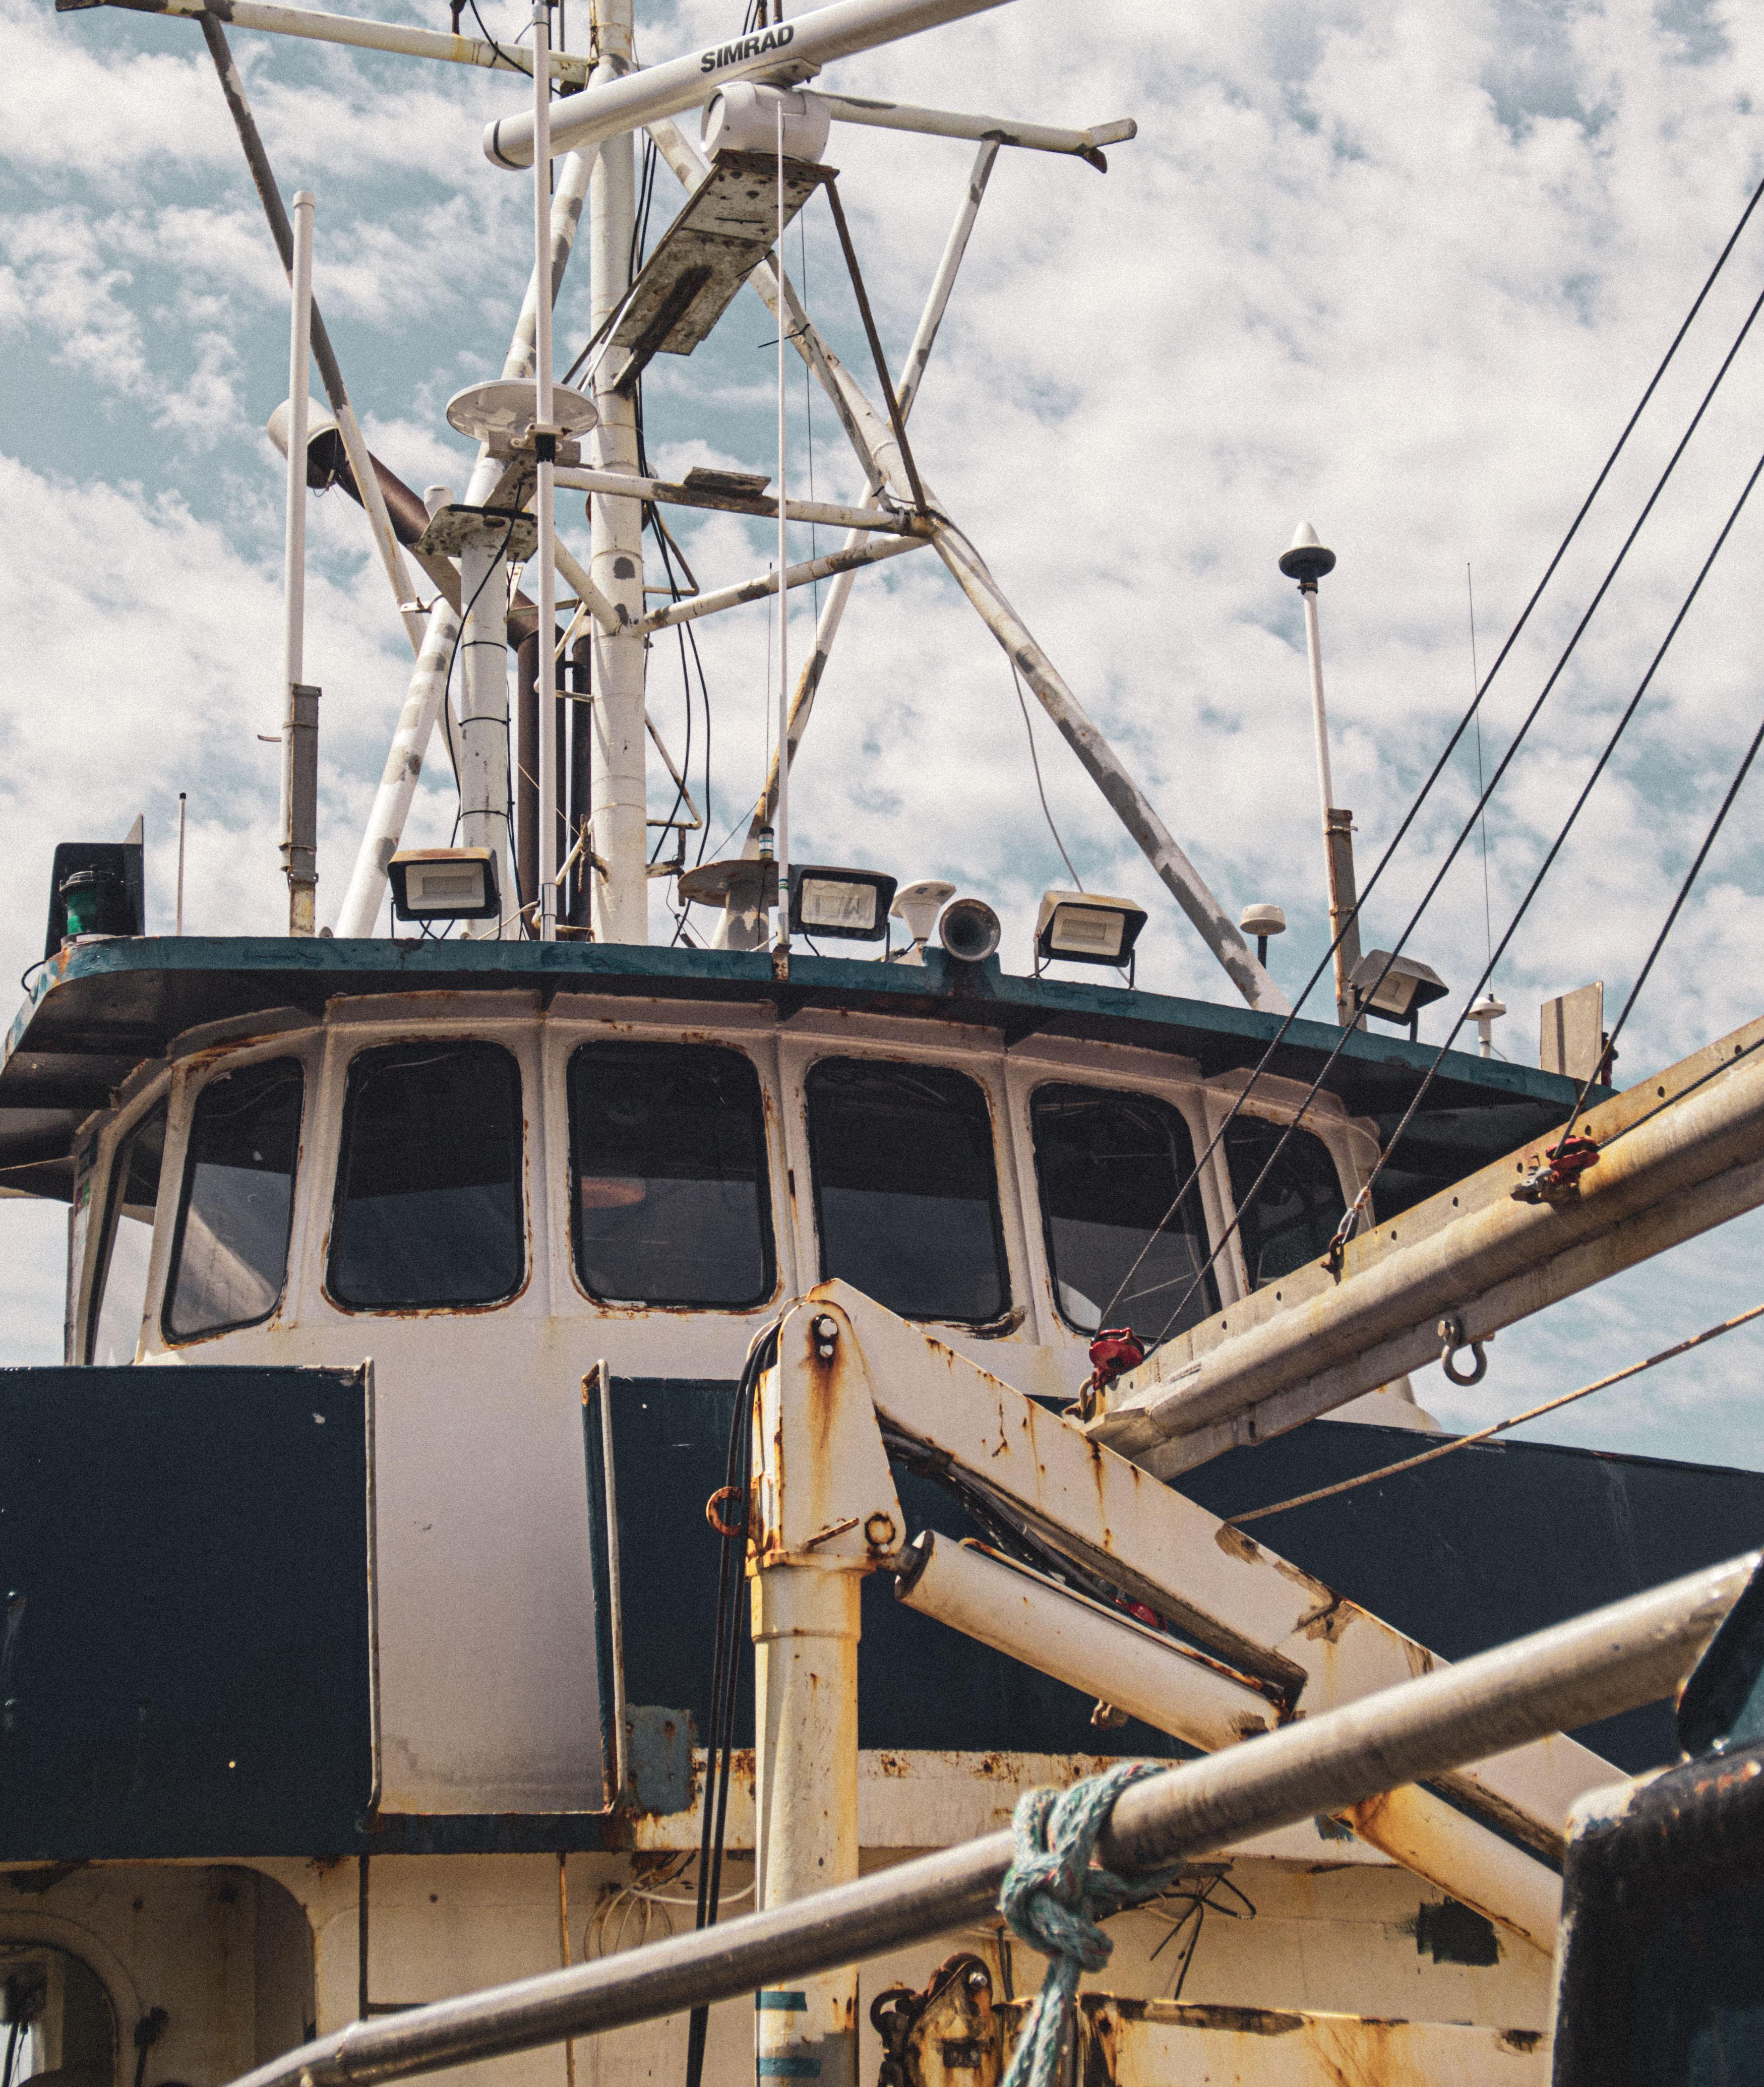 Commercial fishing boat in Bellingham